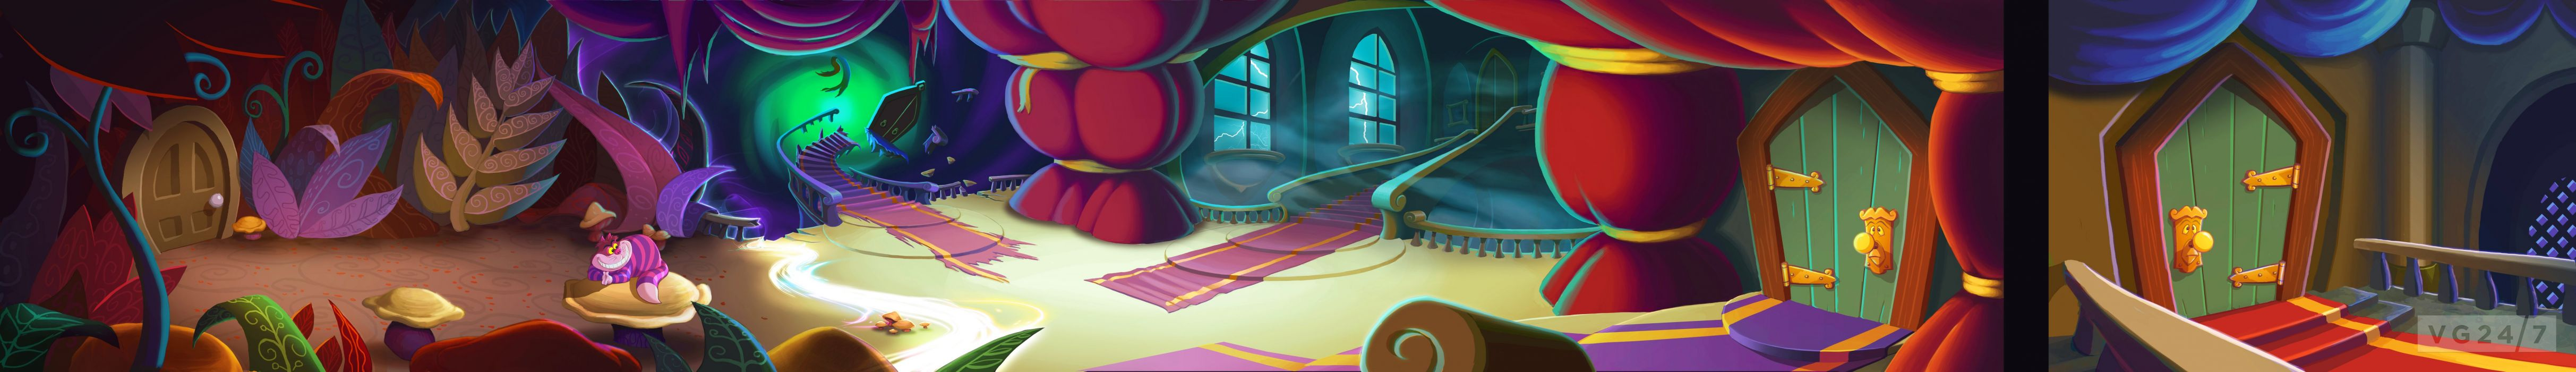 EPIC MICKEY disney platform family adventure puzzle 1epicm animation wallpaper